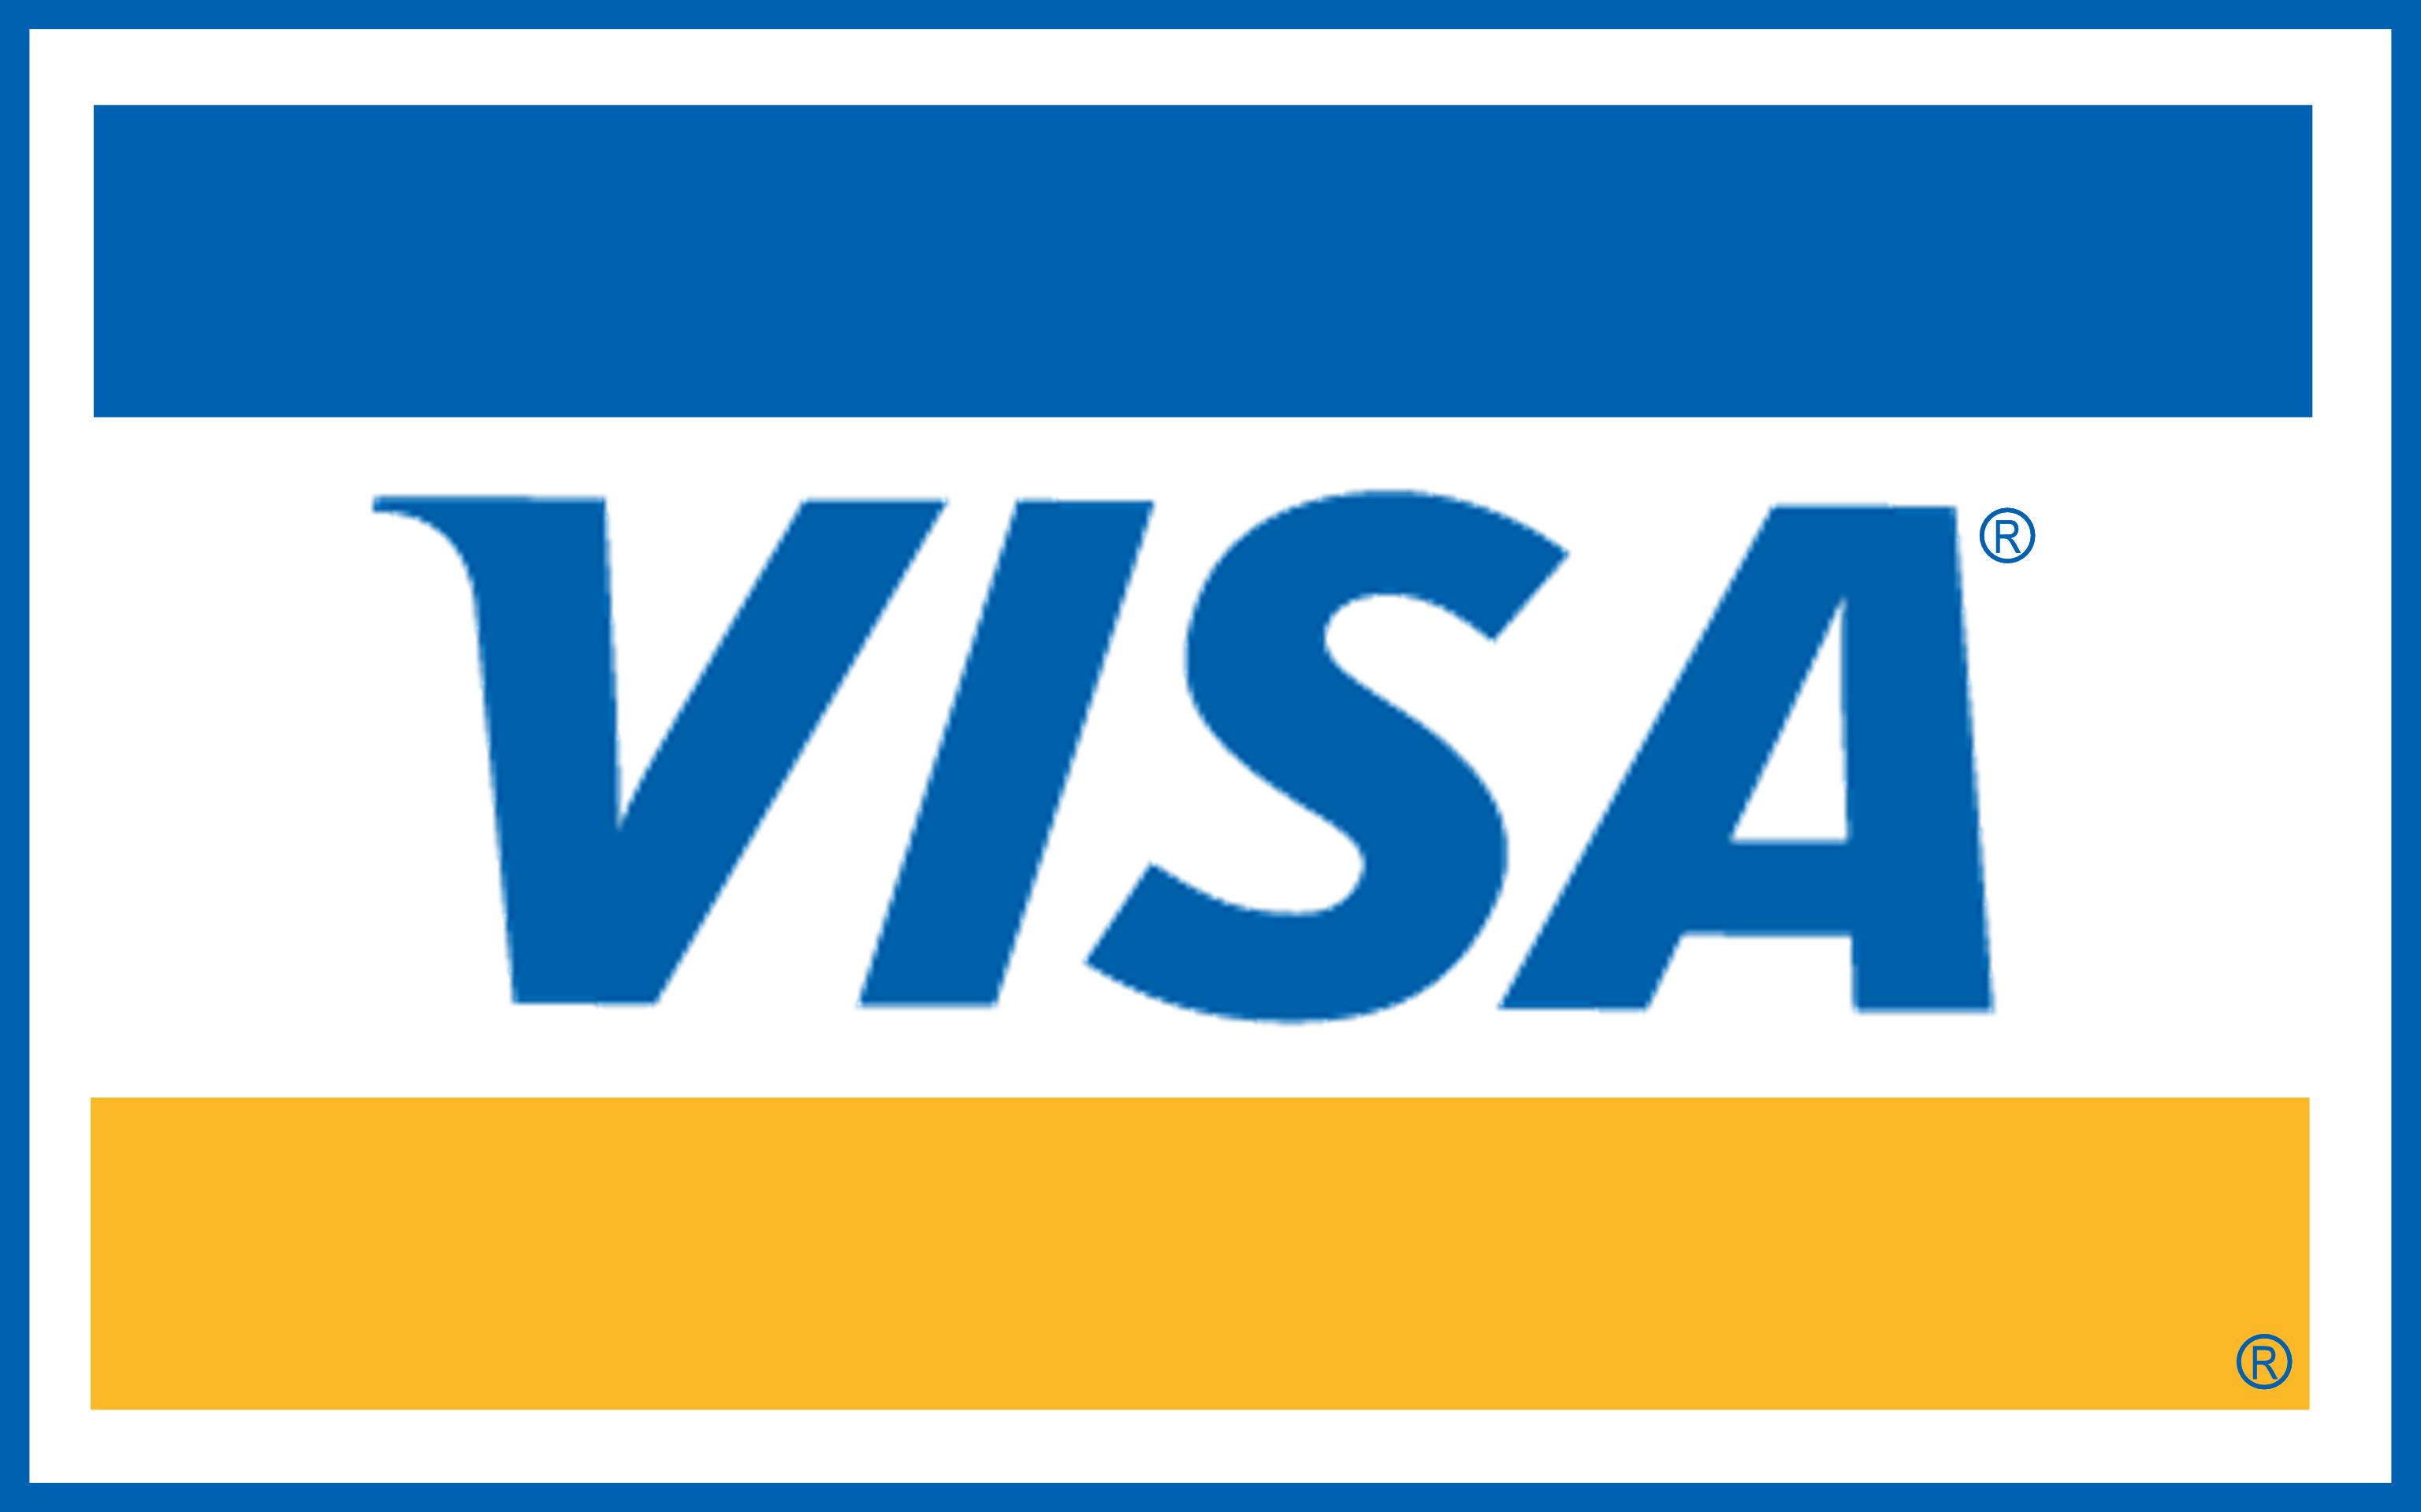 Visa card logo PNG images free download.